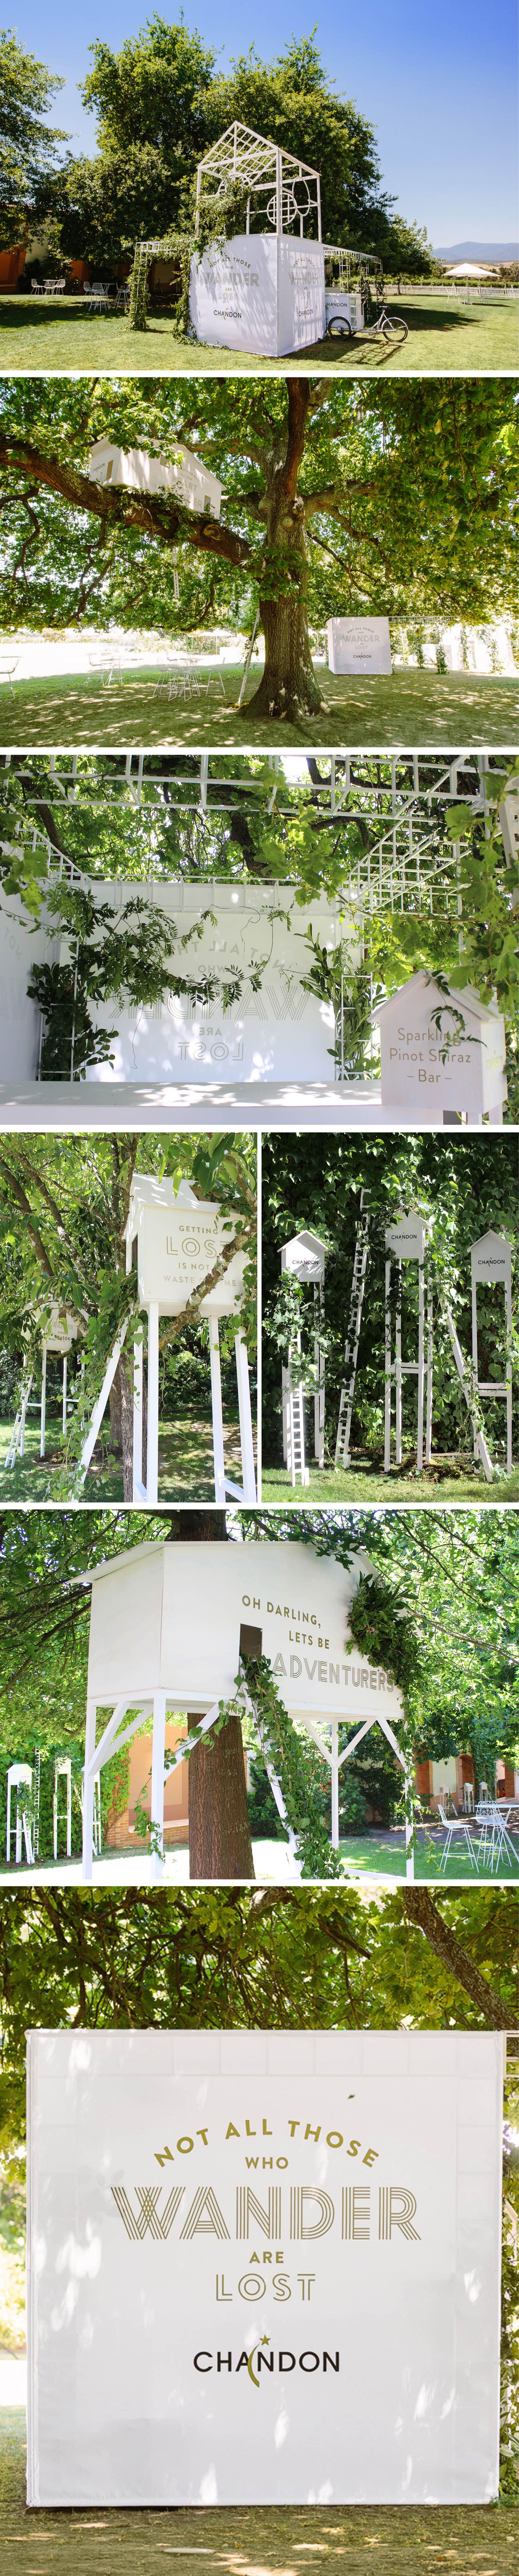 Chandon 'Secret Garden Party'   Yarra Valley   Gloss Creative